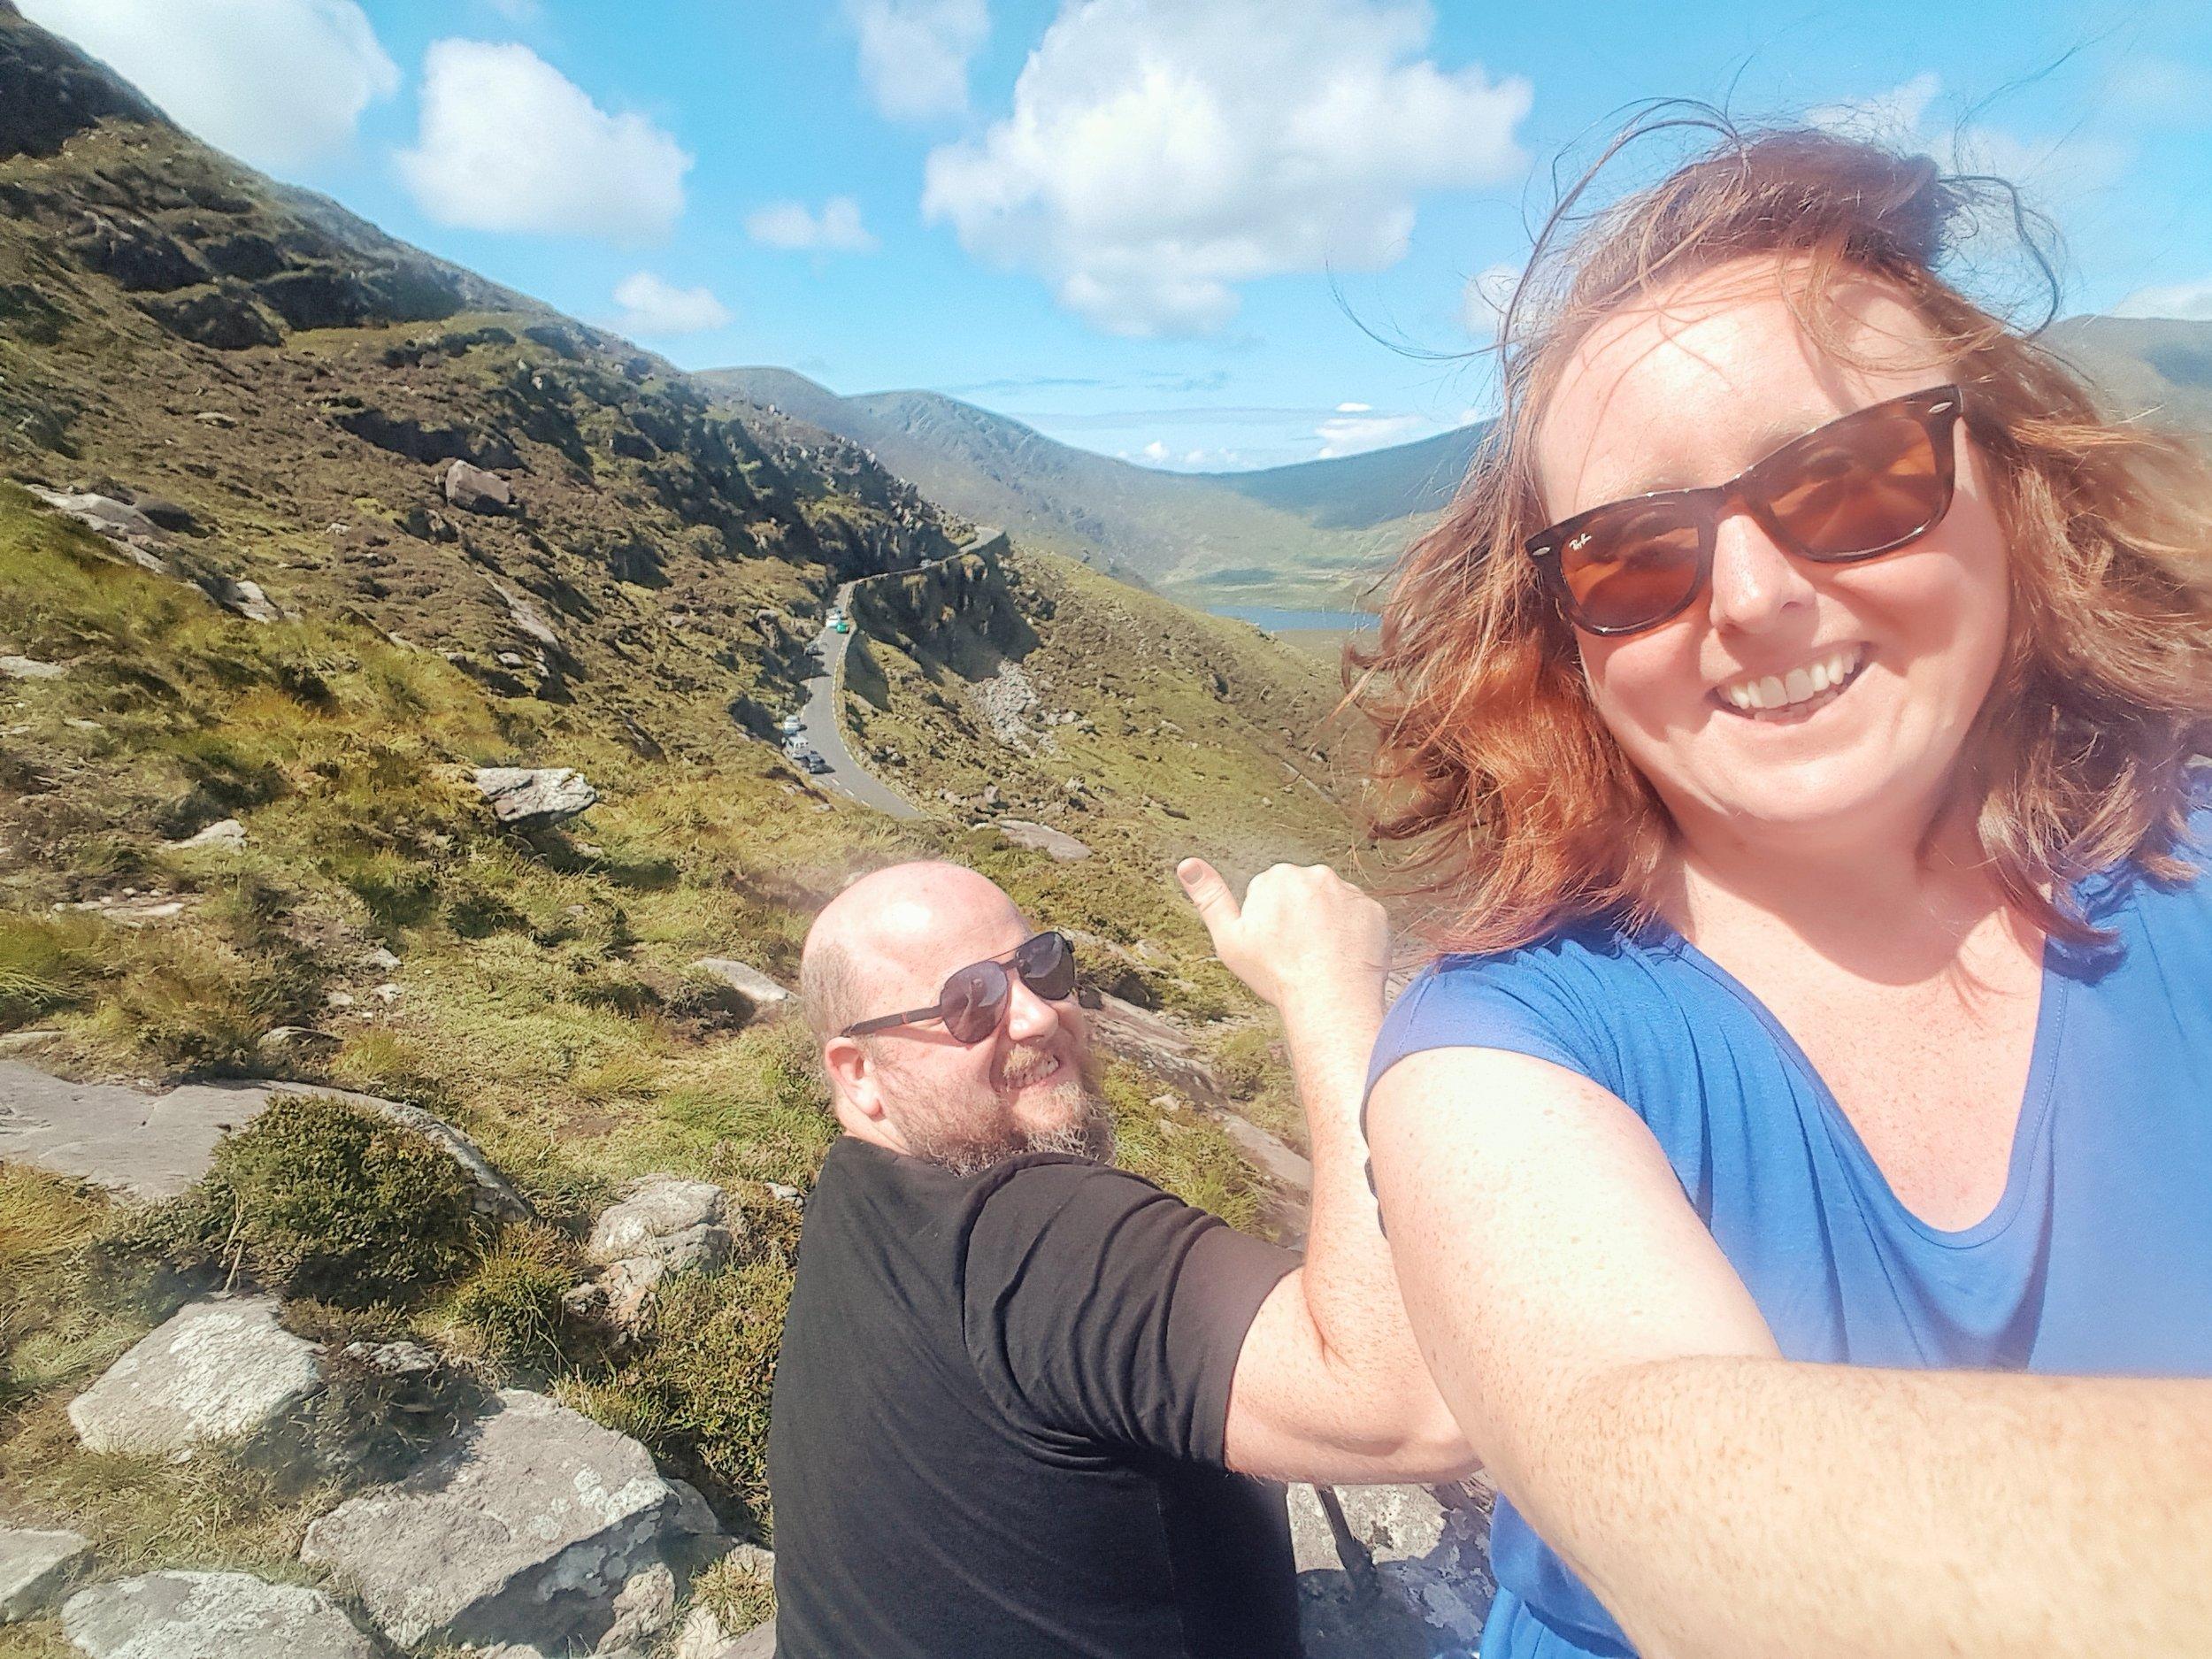 Ireland. Wild Atlantic Way. Kerry. Counthy Kerry. Travel photography. Landscape photography. Blog. Irish. Travelling Ireland. Ireland west coast. Wild Landscape. Trip. Vacation.  (2).jpg